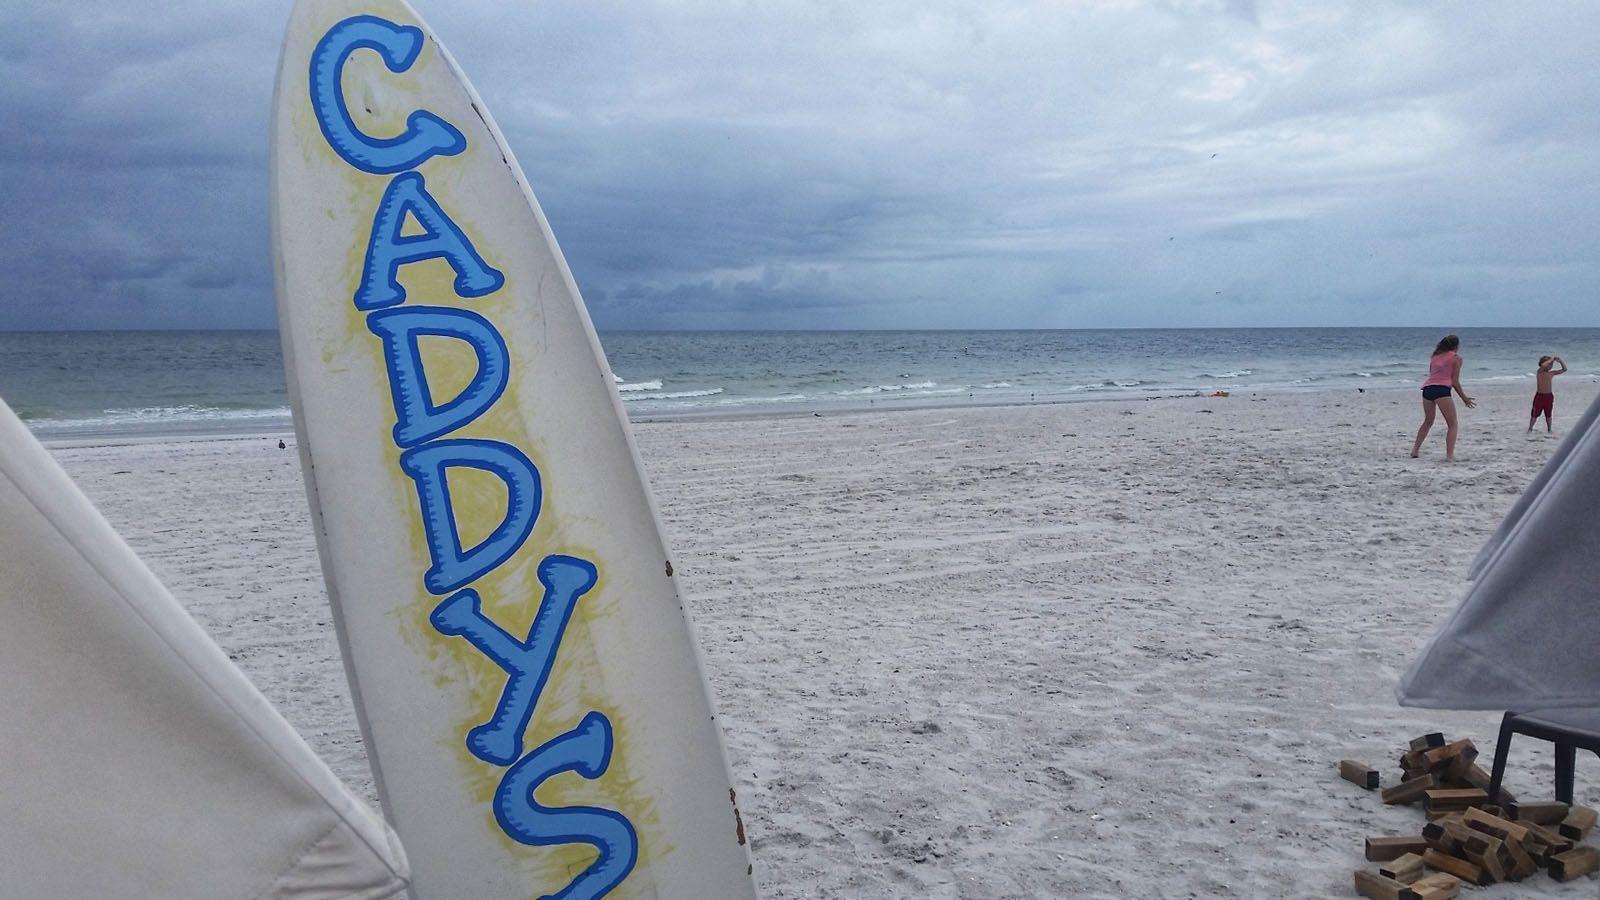 Beach bar pic of the week caddys on the beach treasure